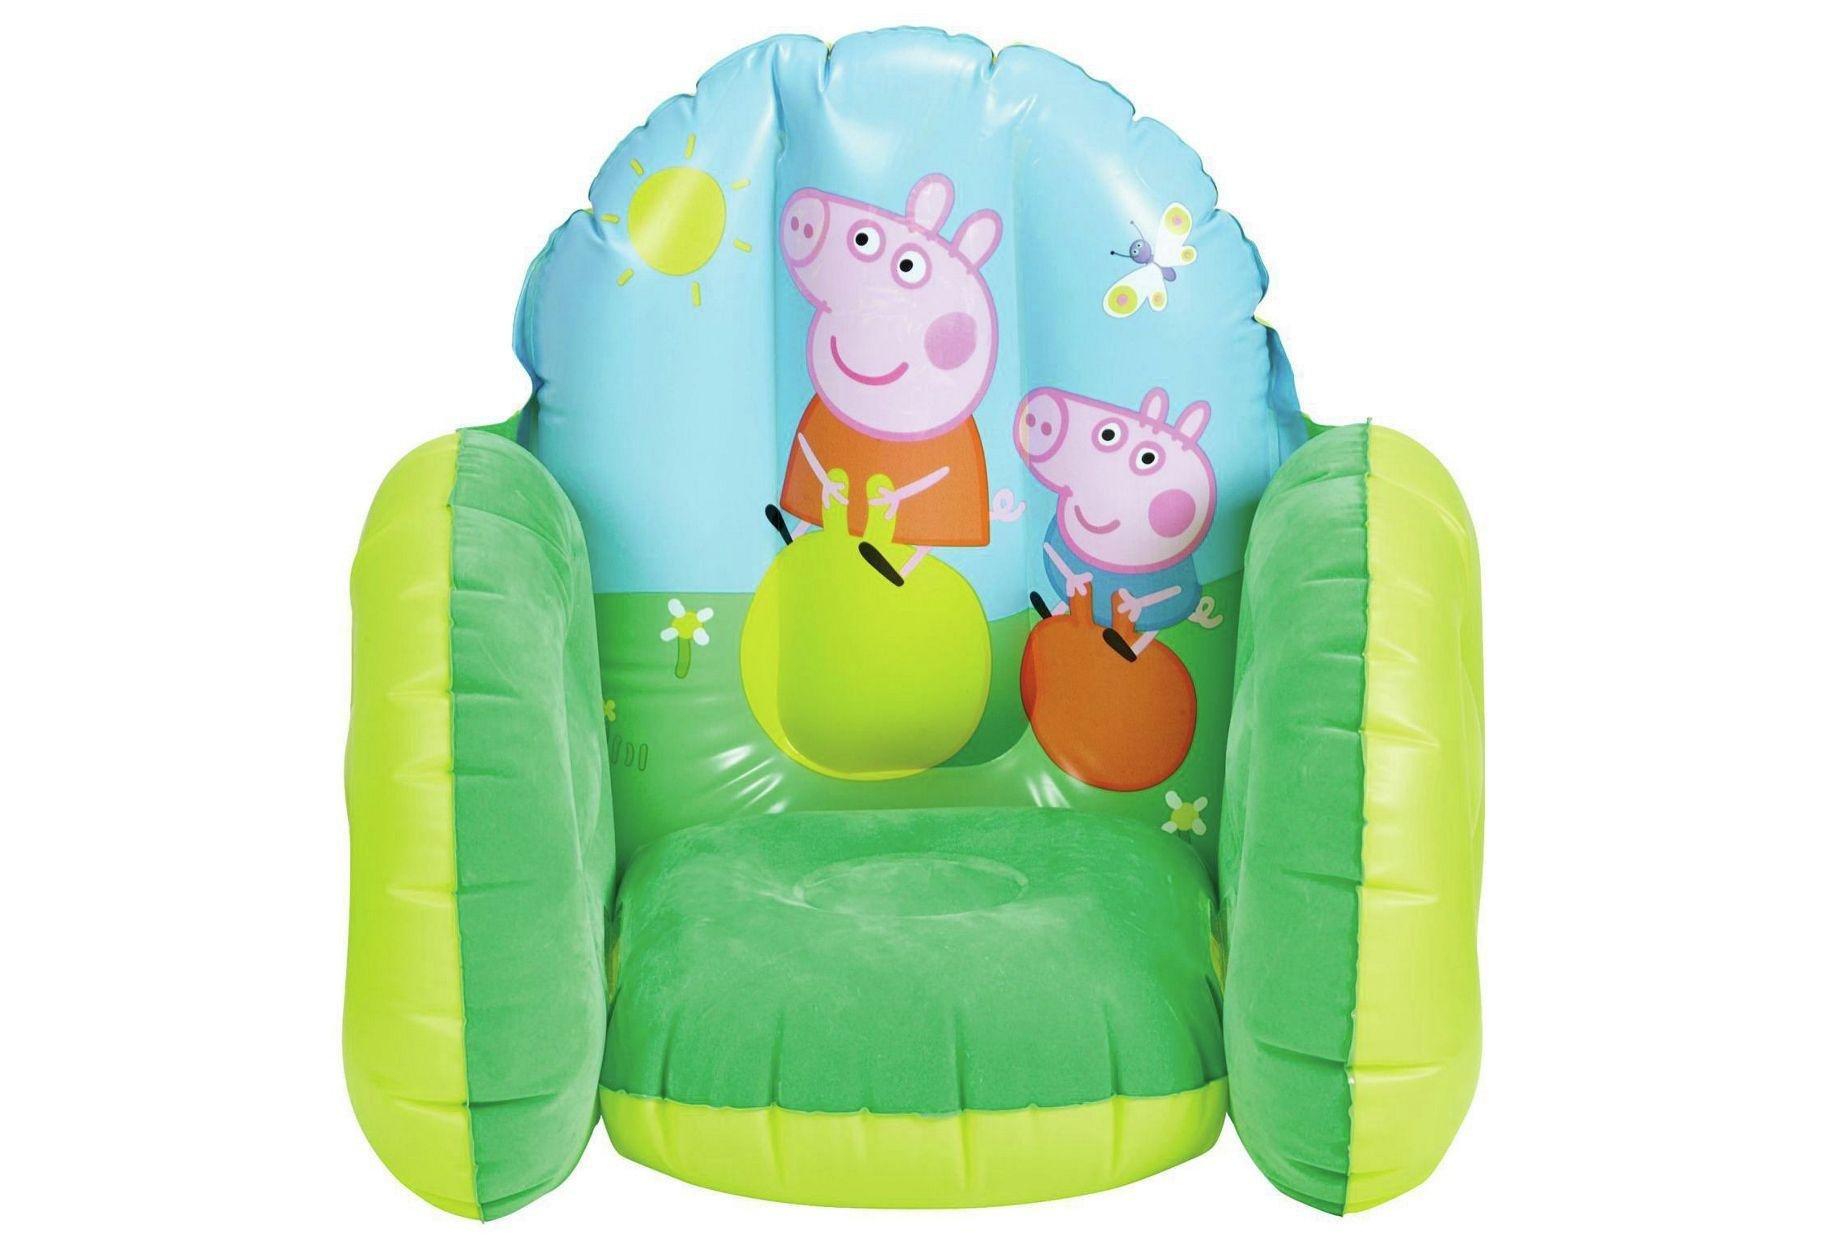 Image of Peppa Pig Flocked Chair